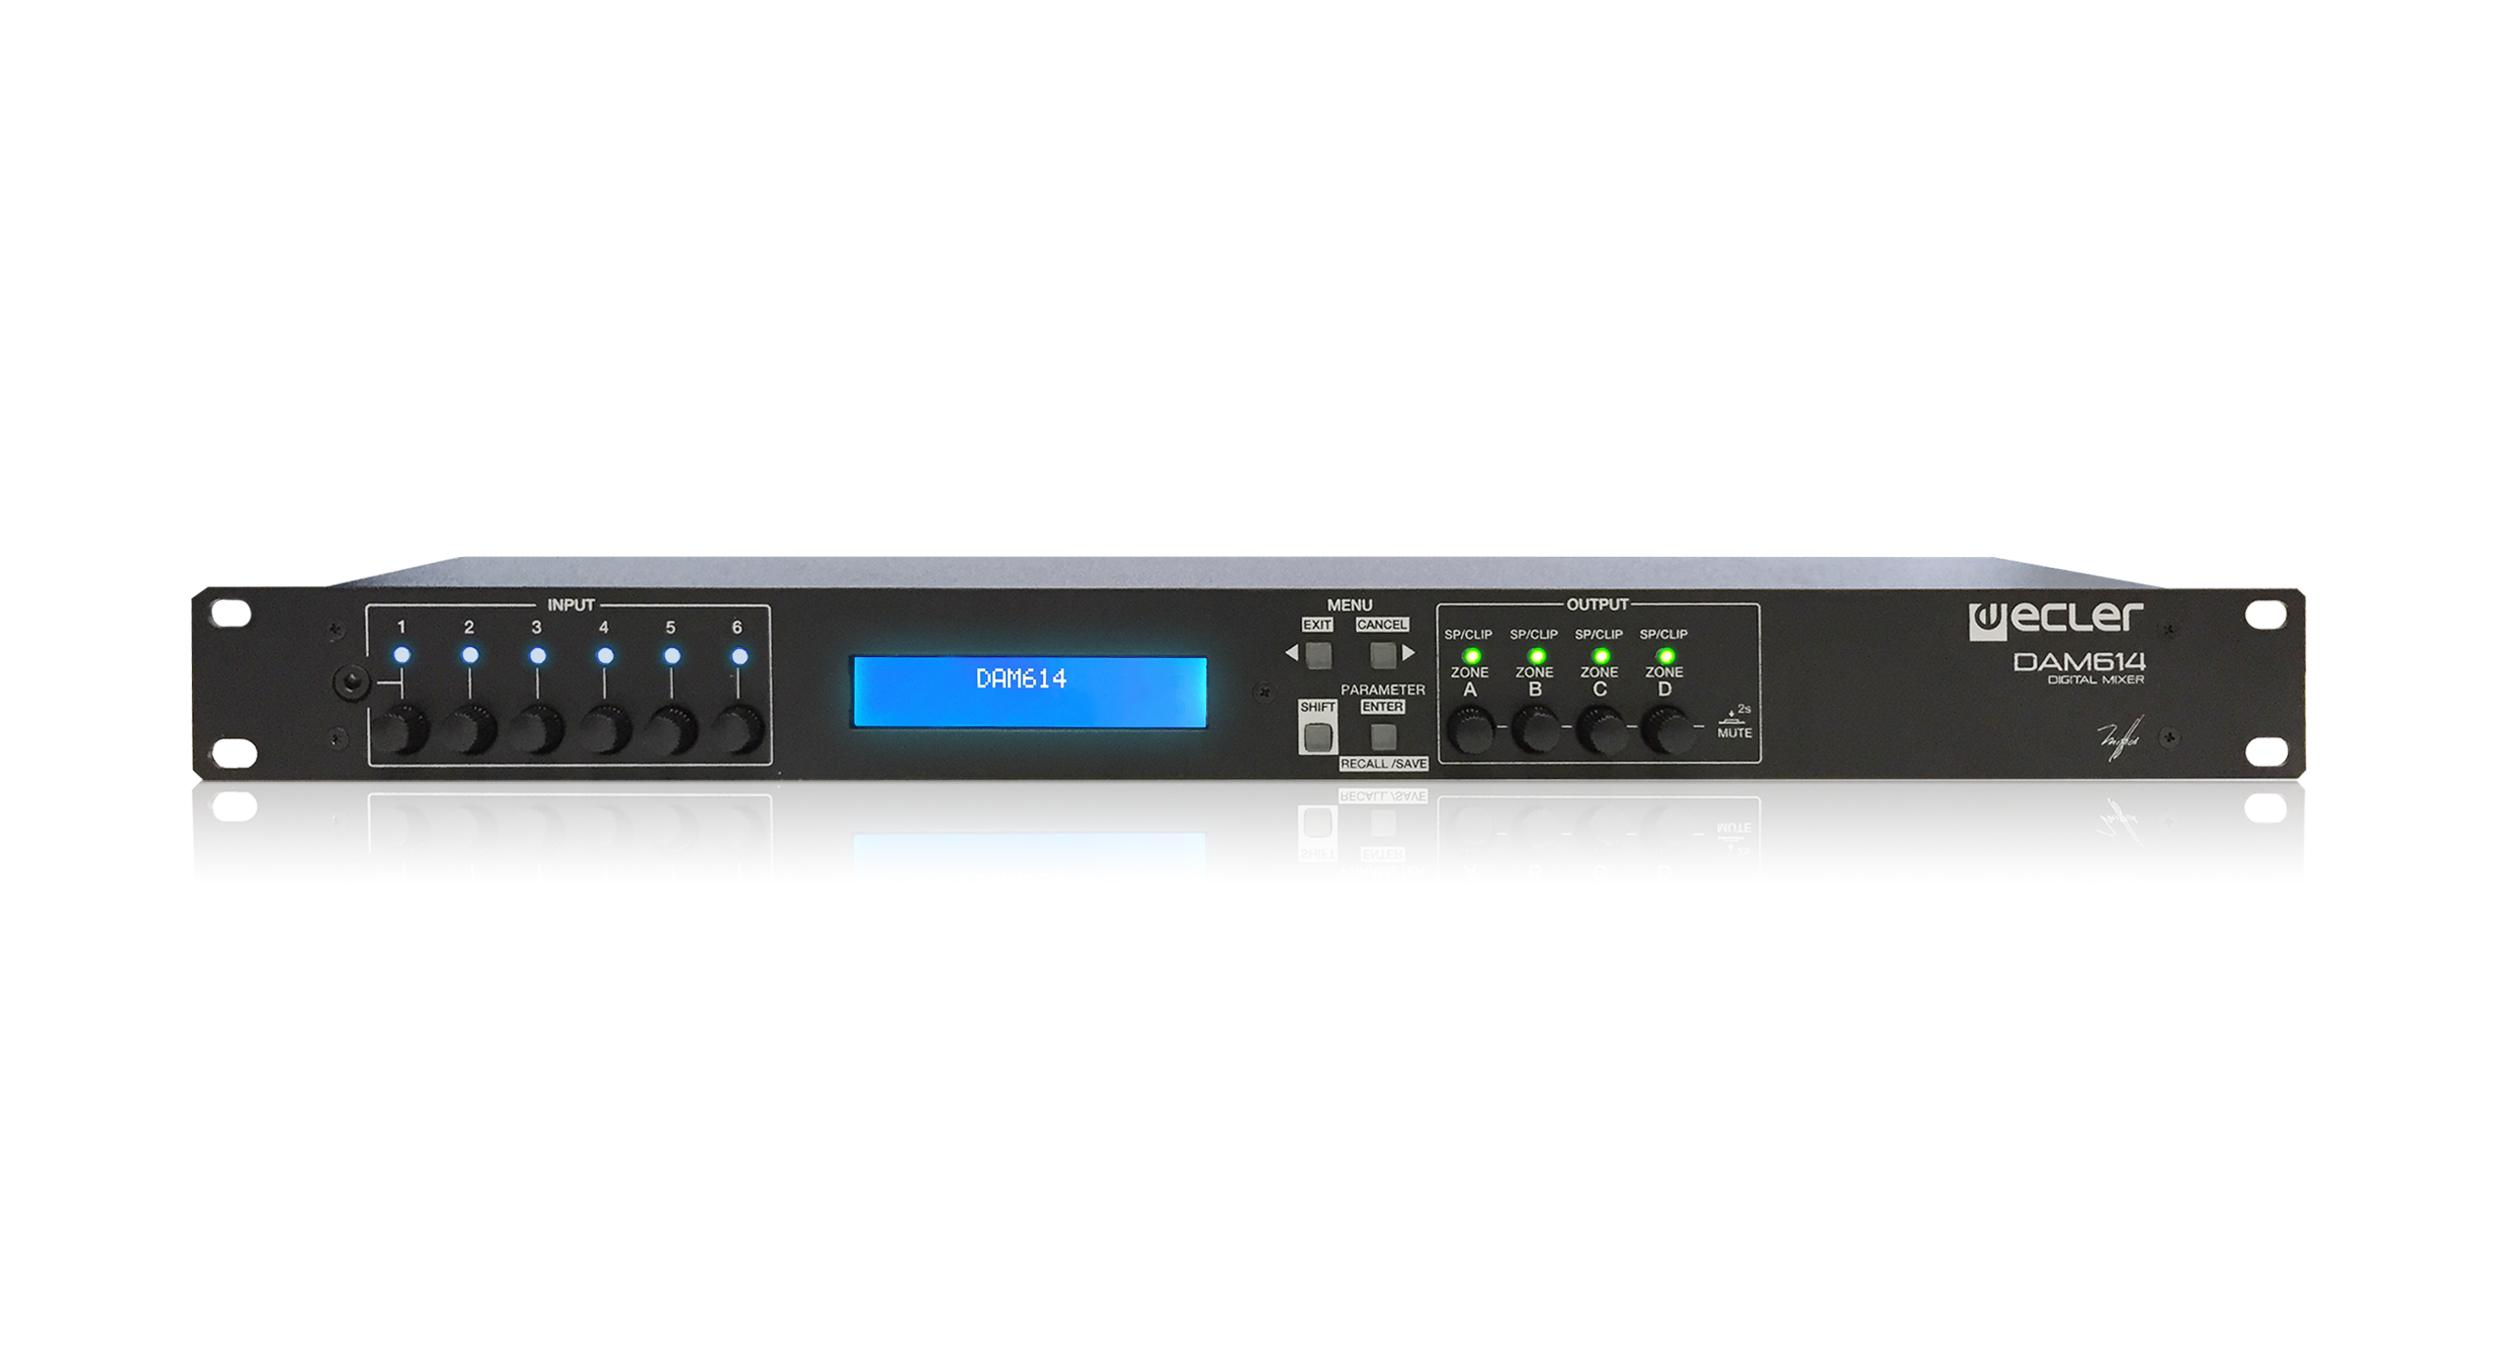 Ecler DAM 614 Installation Digital Mixer